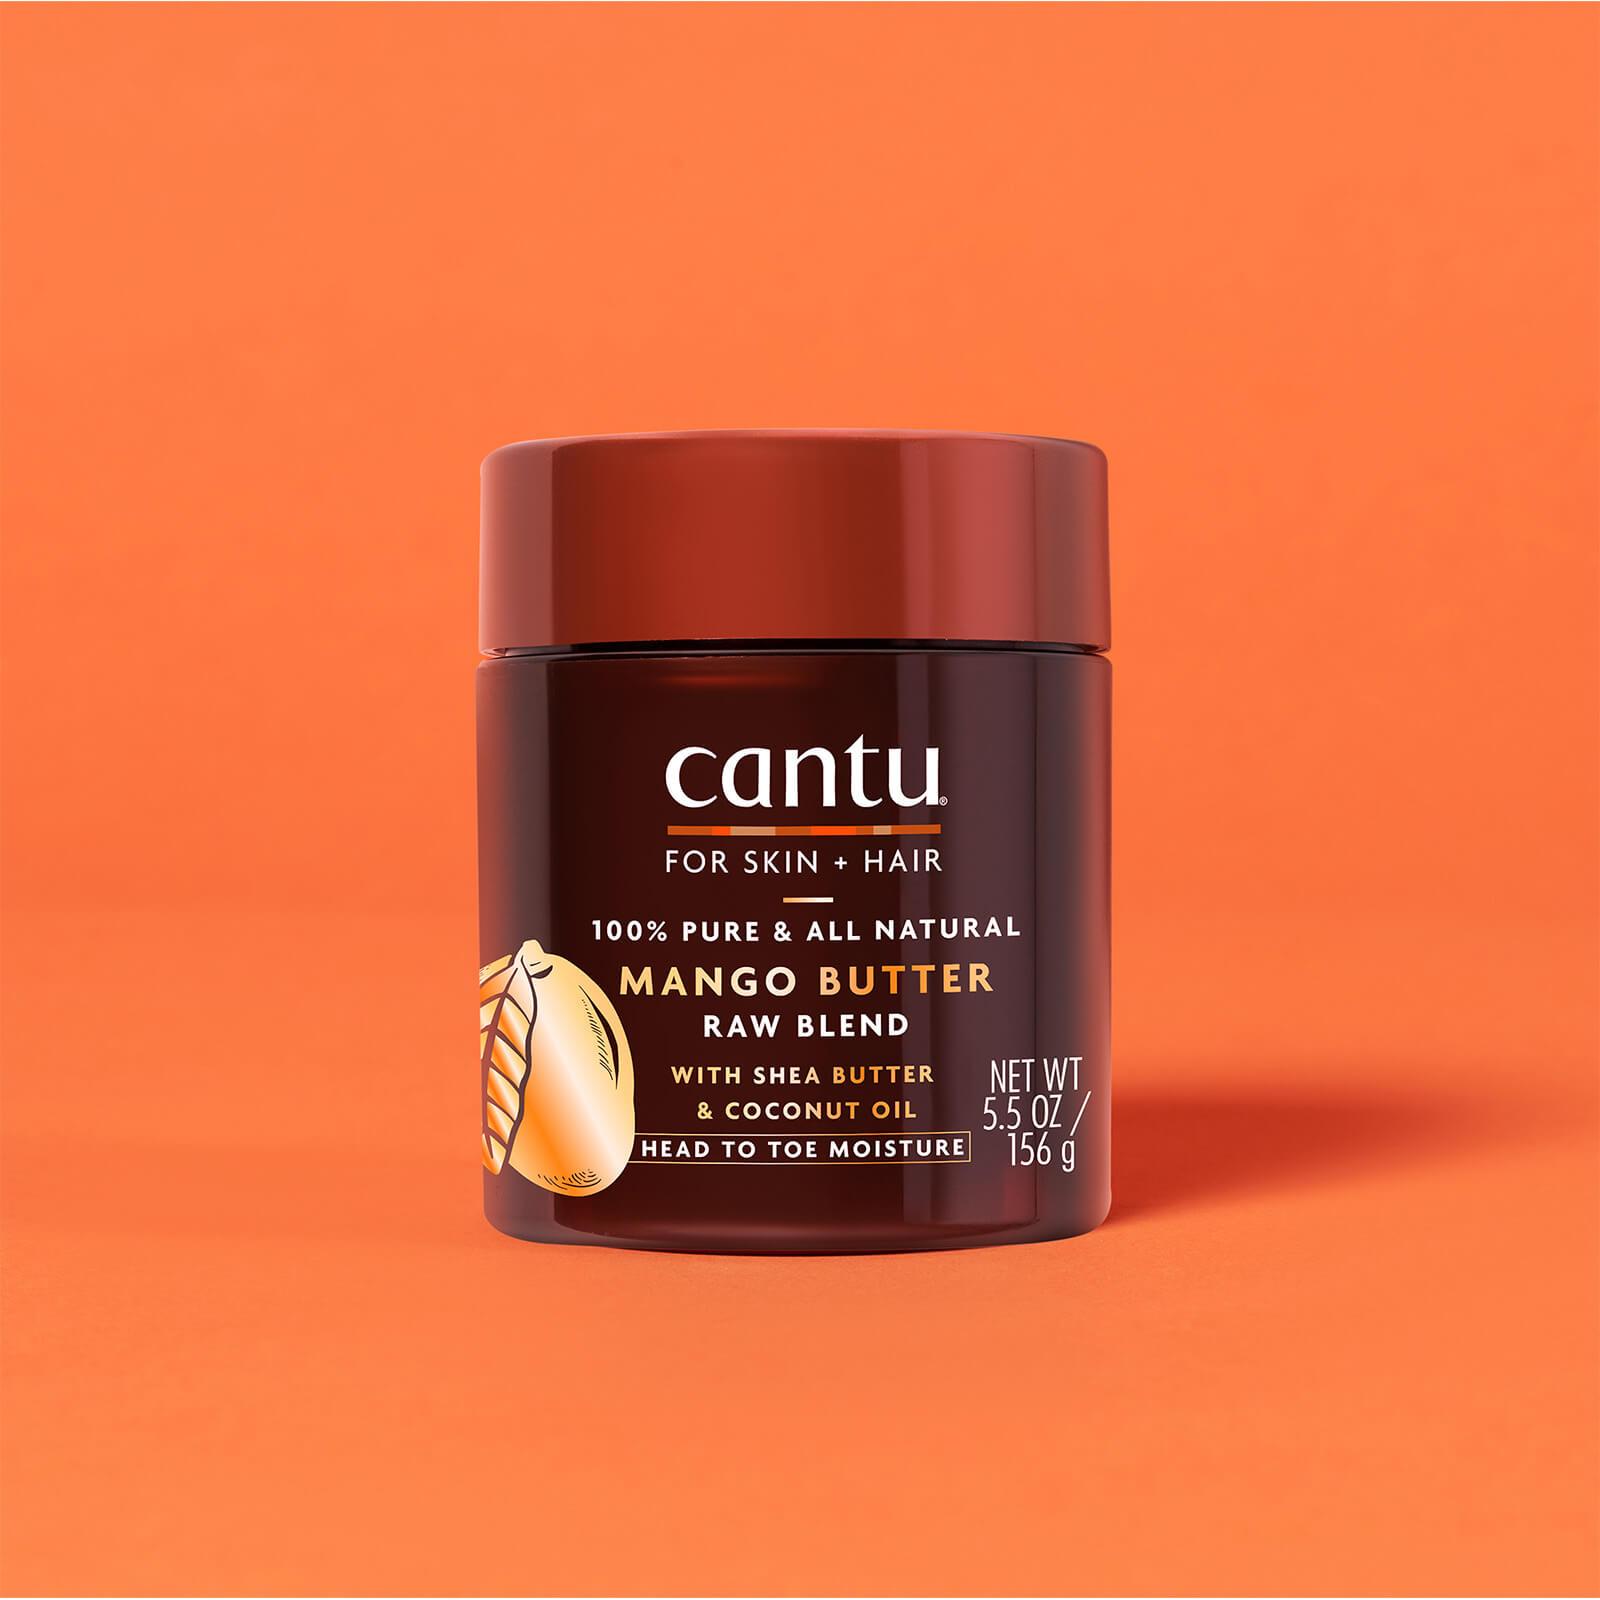 Купить Cantu Skin Therapy Mango Butter Raw Blend 156g